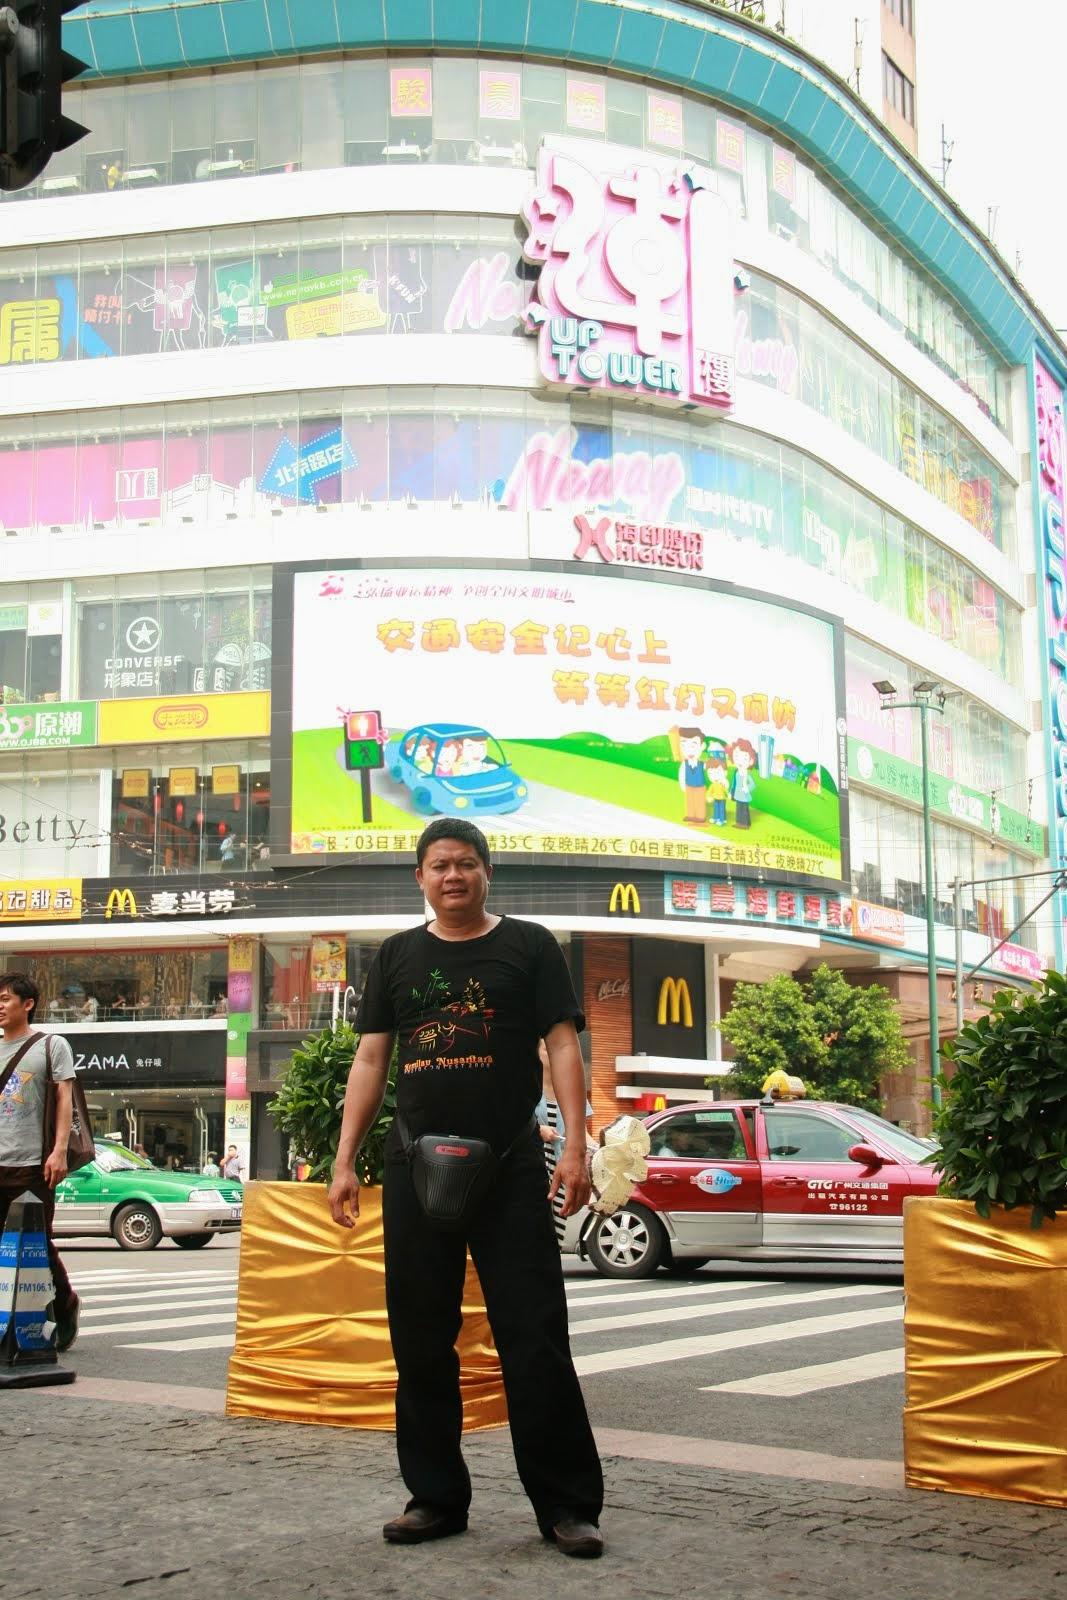 Di pusat perbelanjaan Bejing Lu, China. 2011